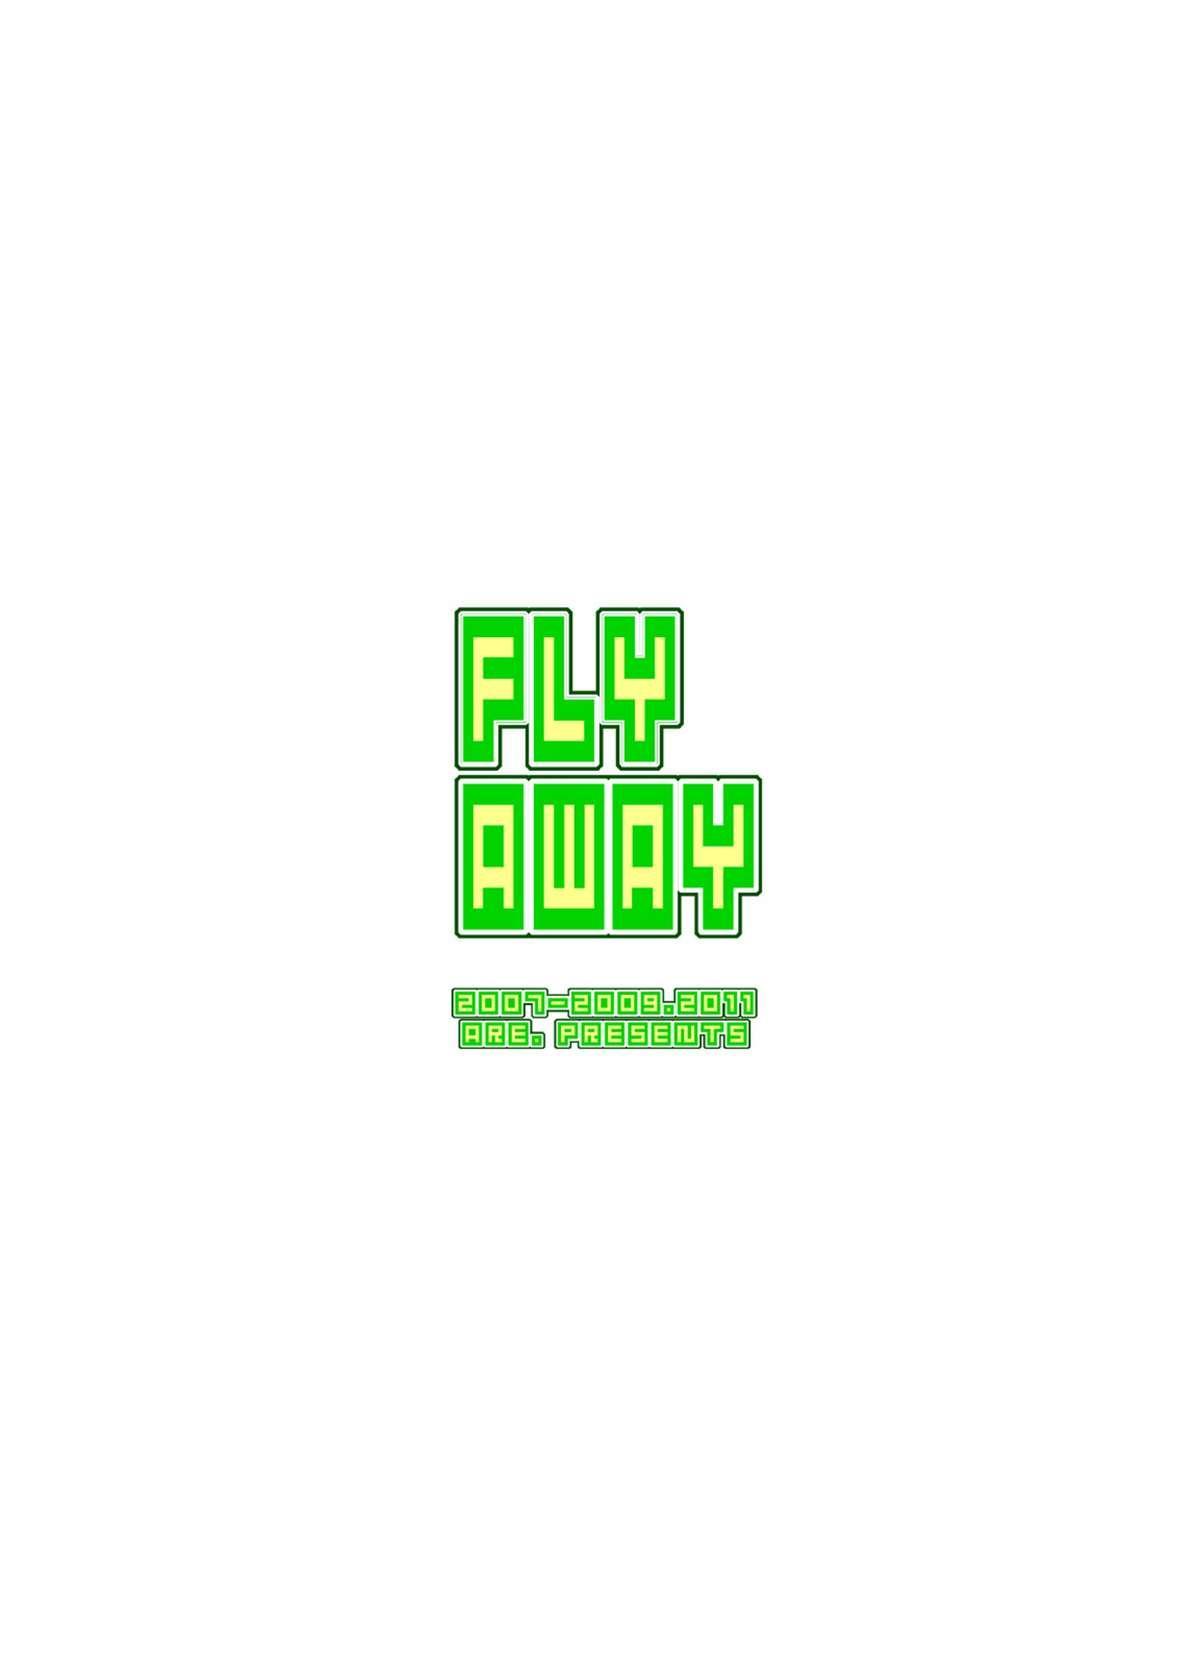 FLY AWAY 76